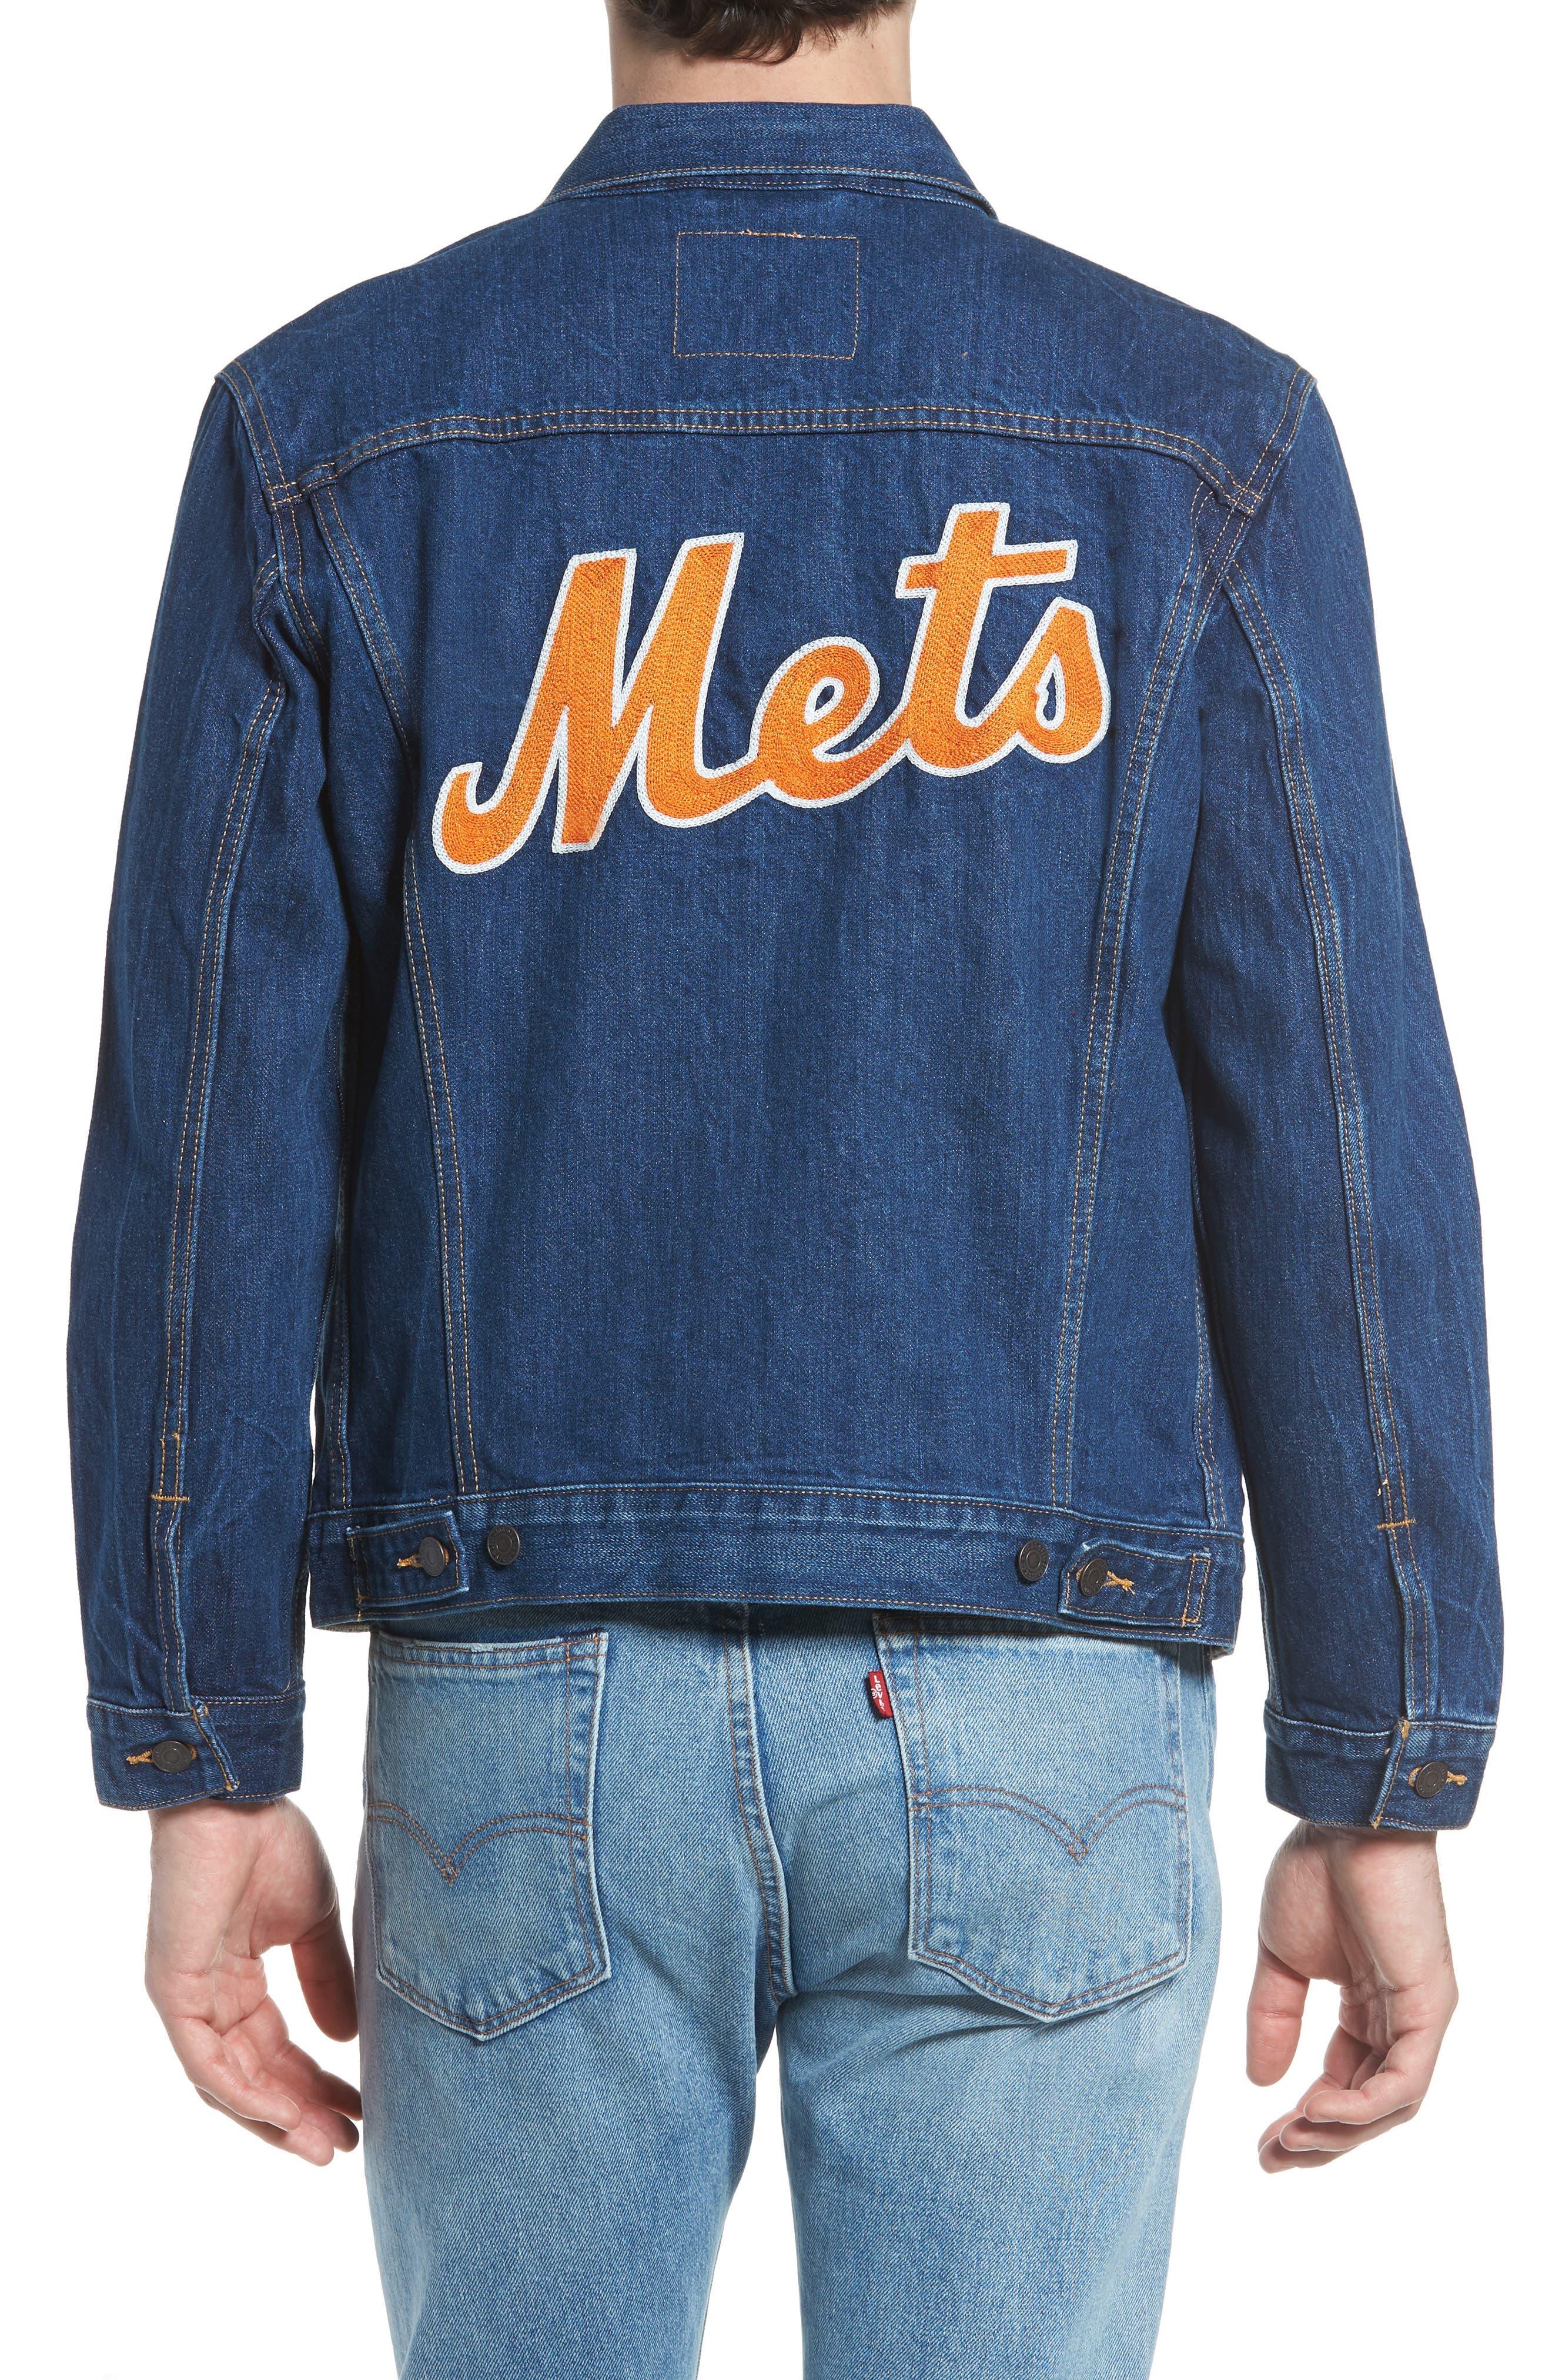 MLB Mets Denim Trucker Jacket,                             Alternate thumbnail 2, color,                             METS